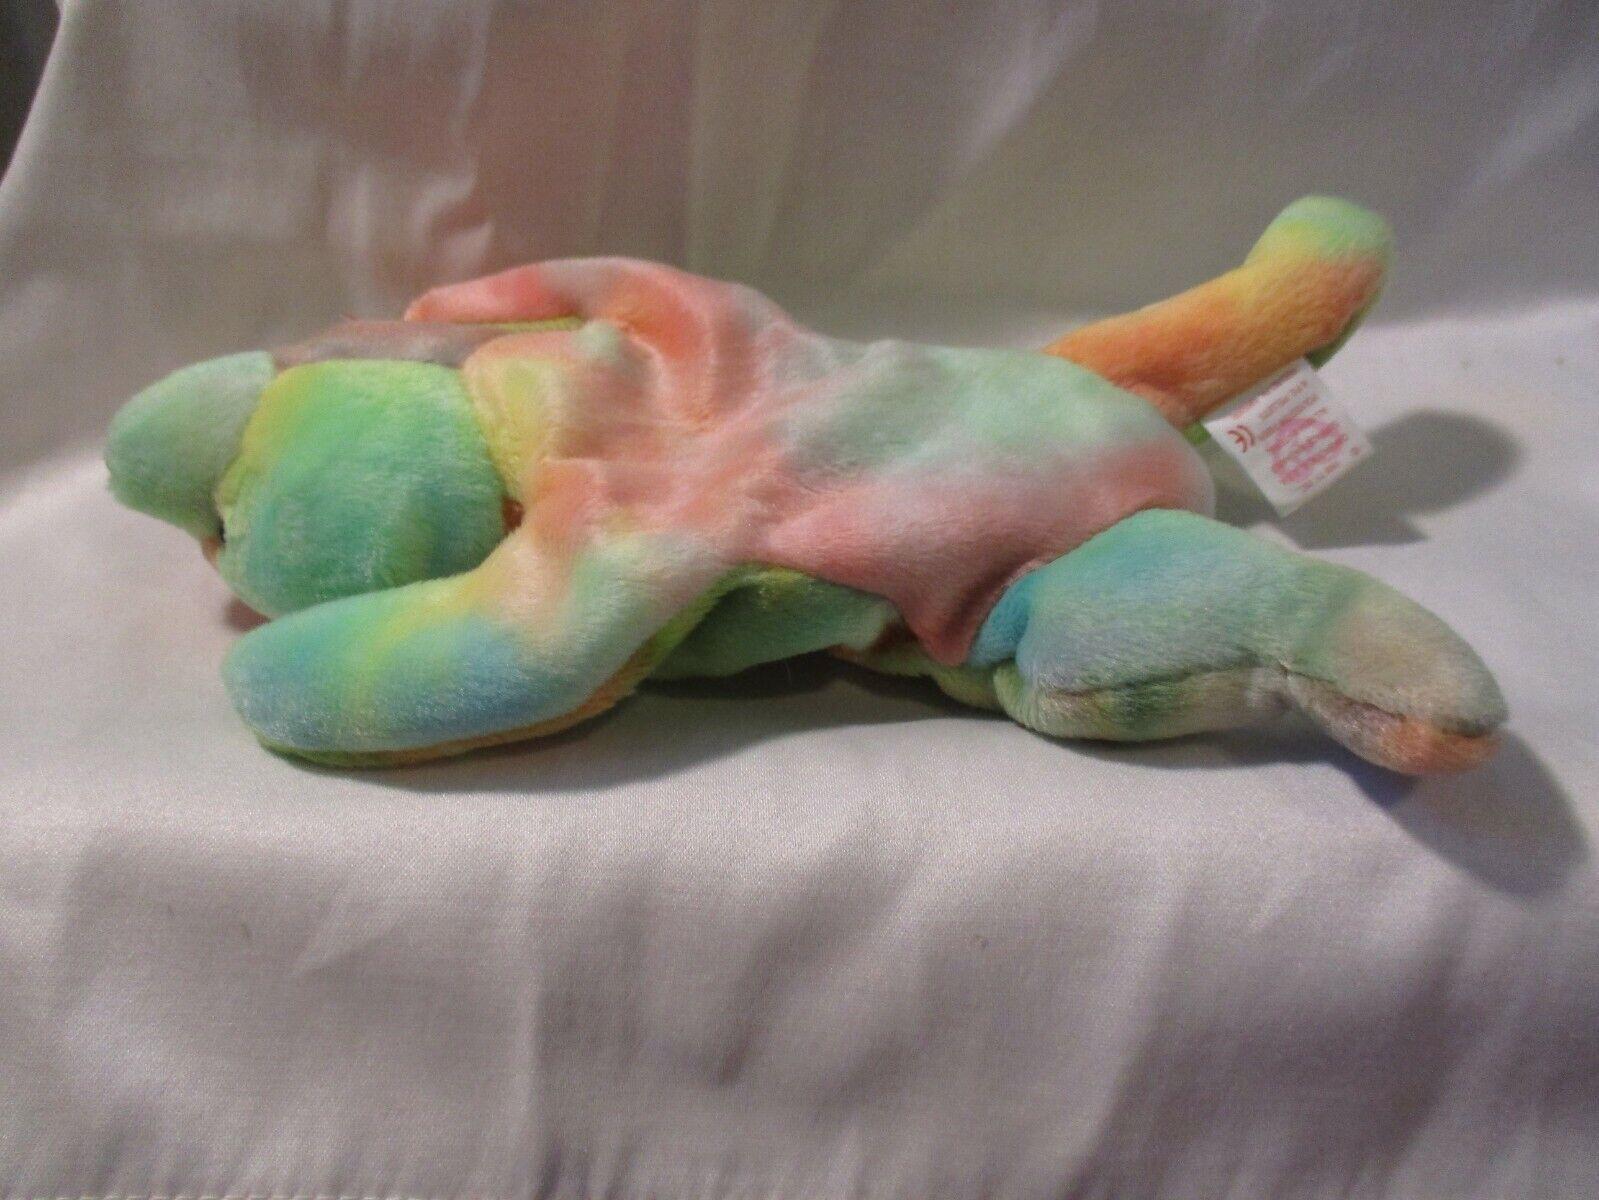 TY Beanie Babies Original Sammy 5th Generation Hologram